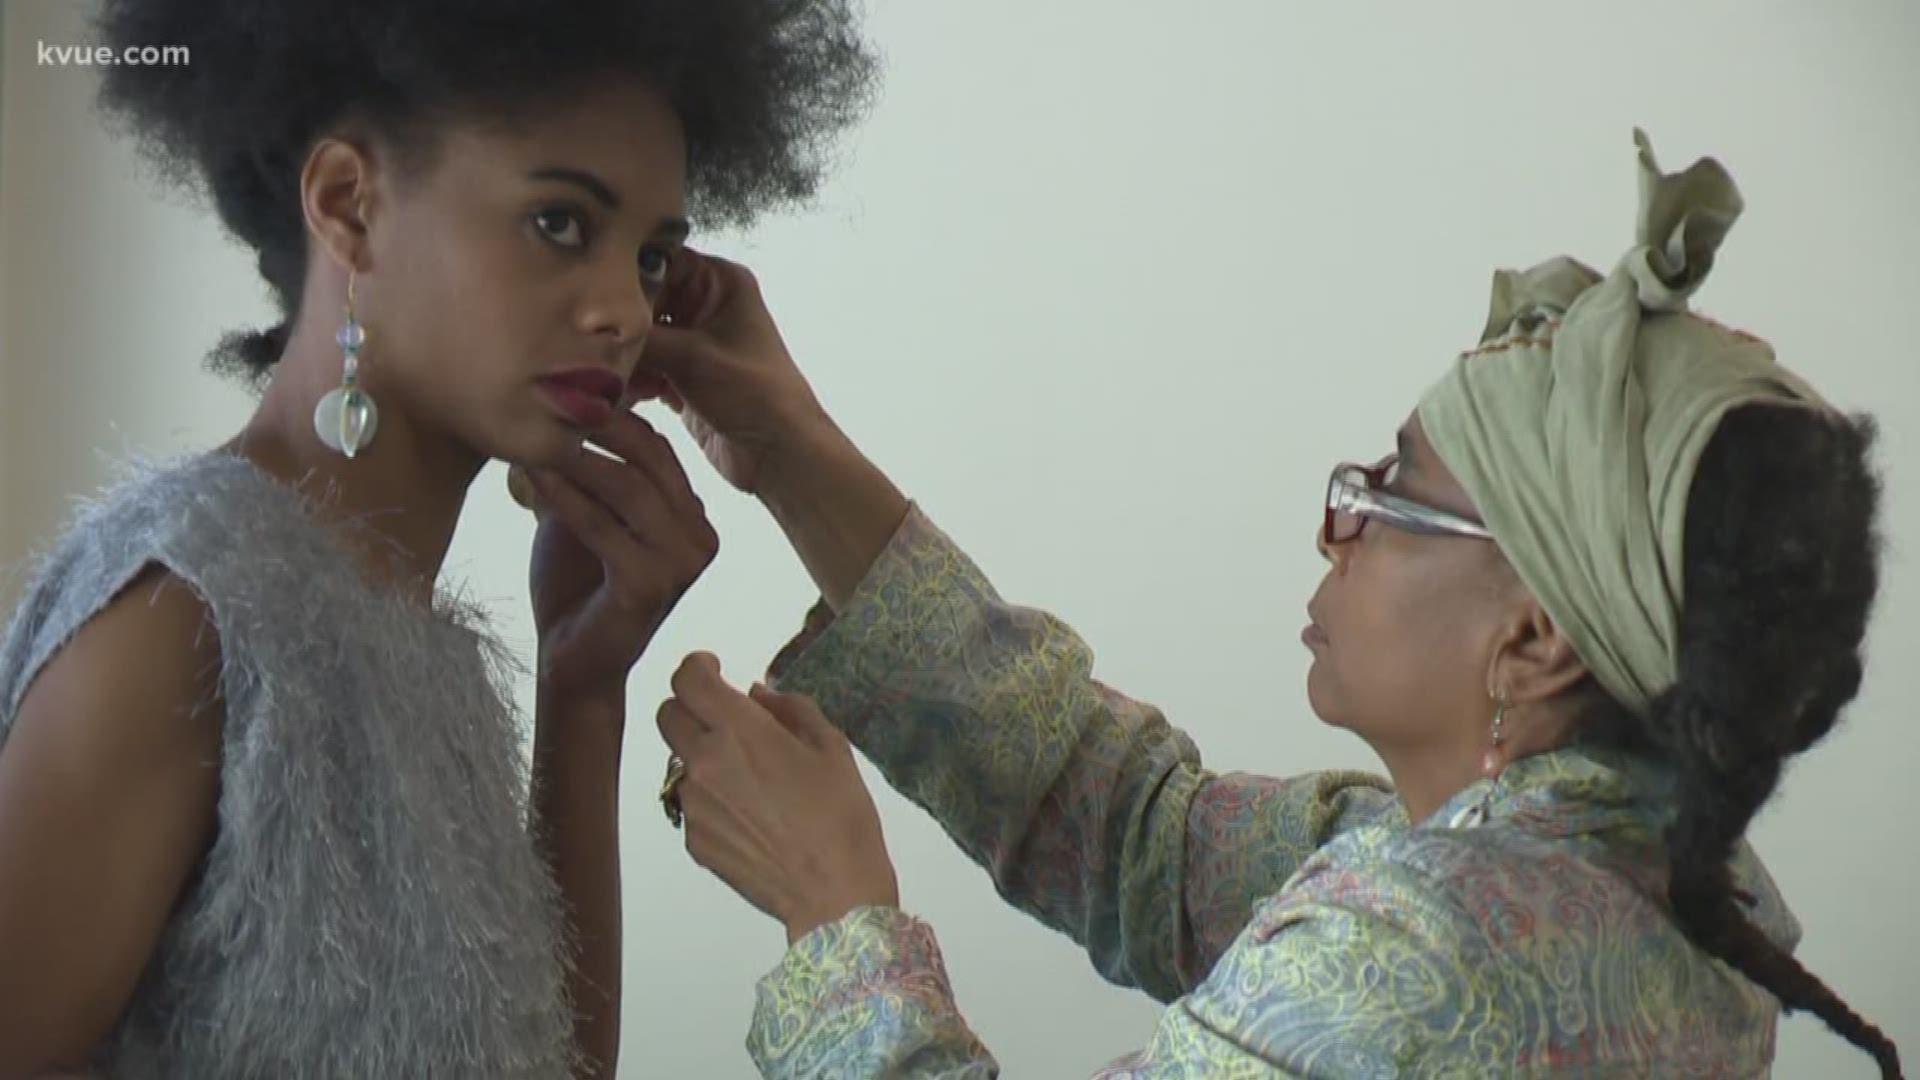 Austin Fashion Designer Embraces Her African American Heritage Kvue Com